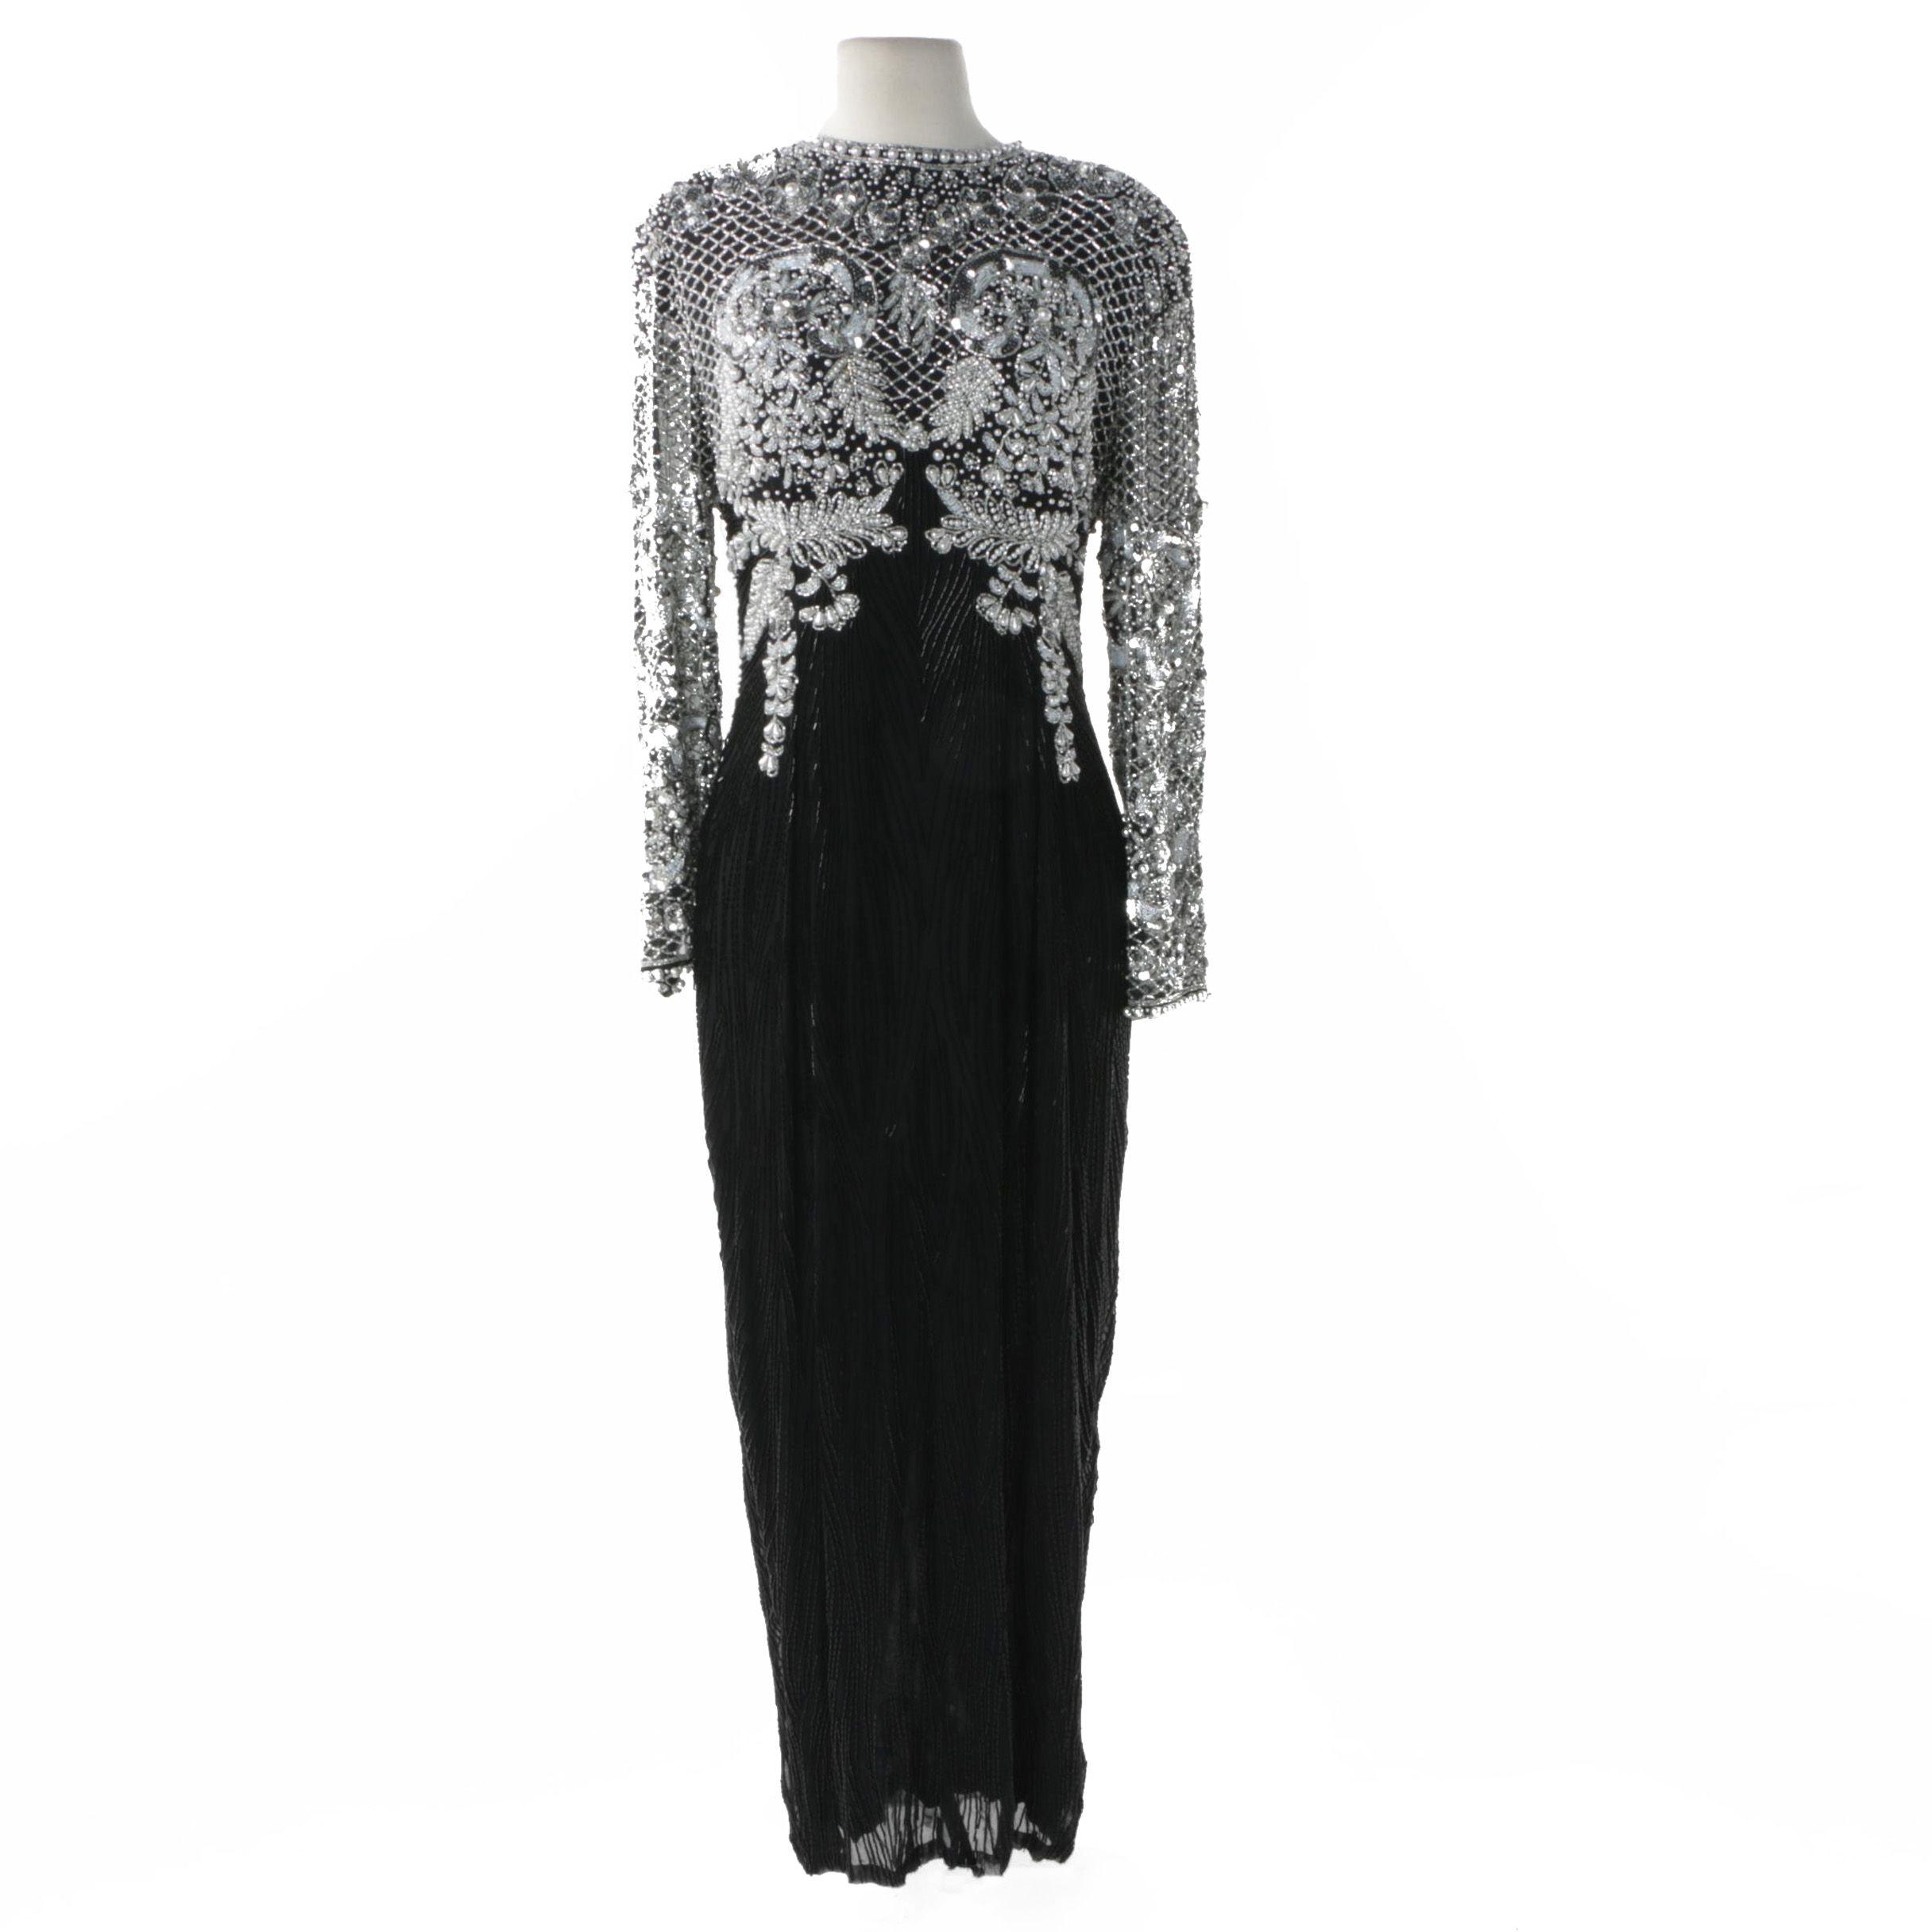 Vintage Black Tie Beaded Silk Evening Dress